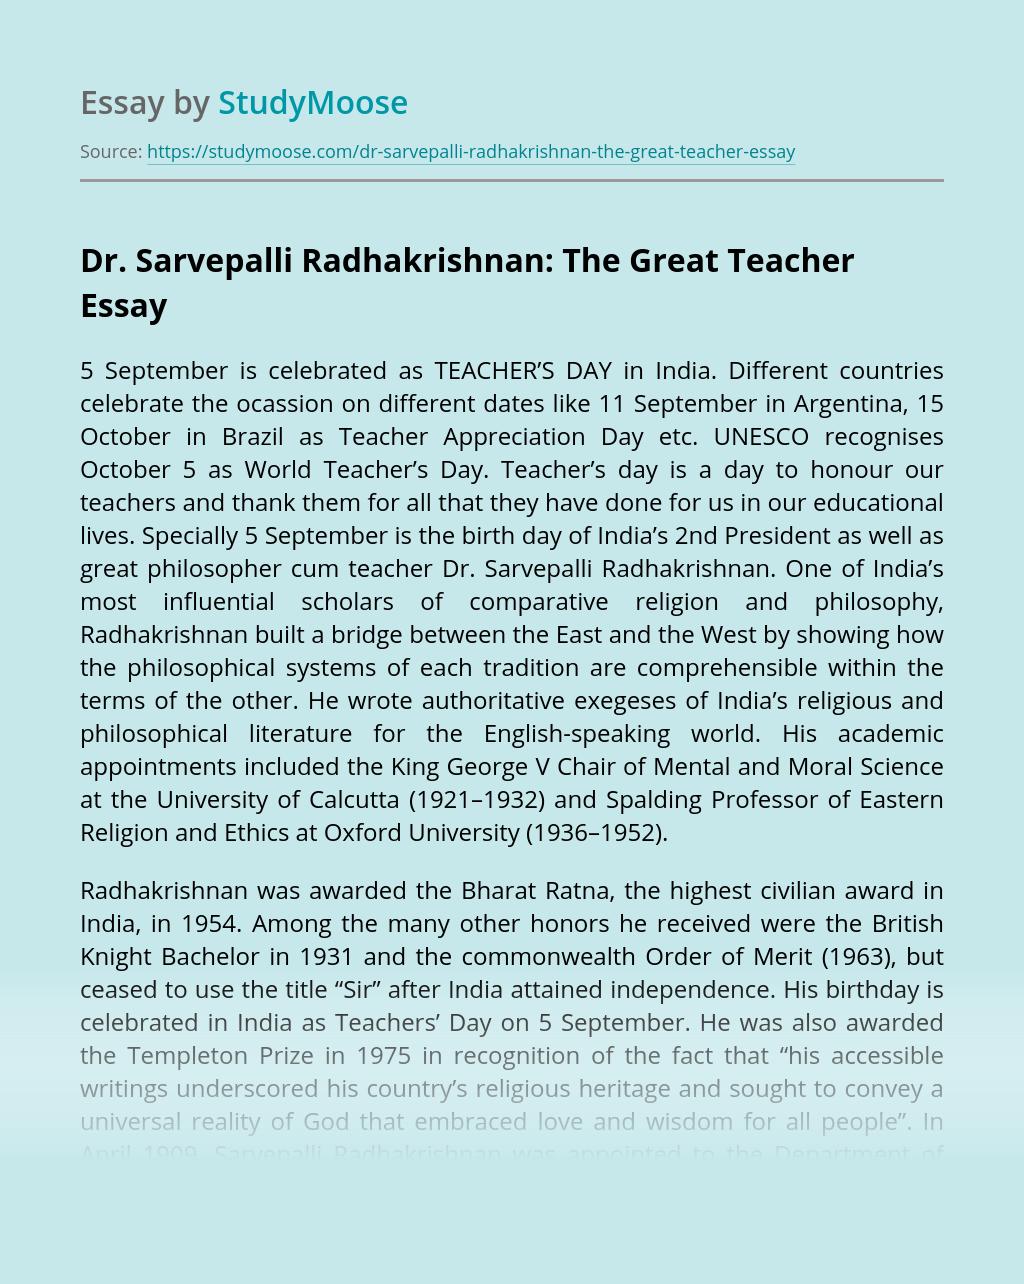 Dr. Sarvepalli Radhakrishnan: The Great Teacher